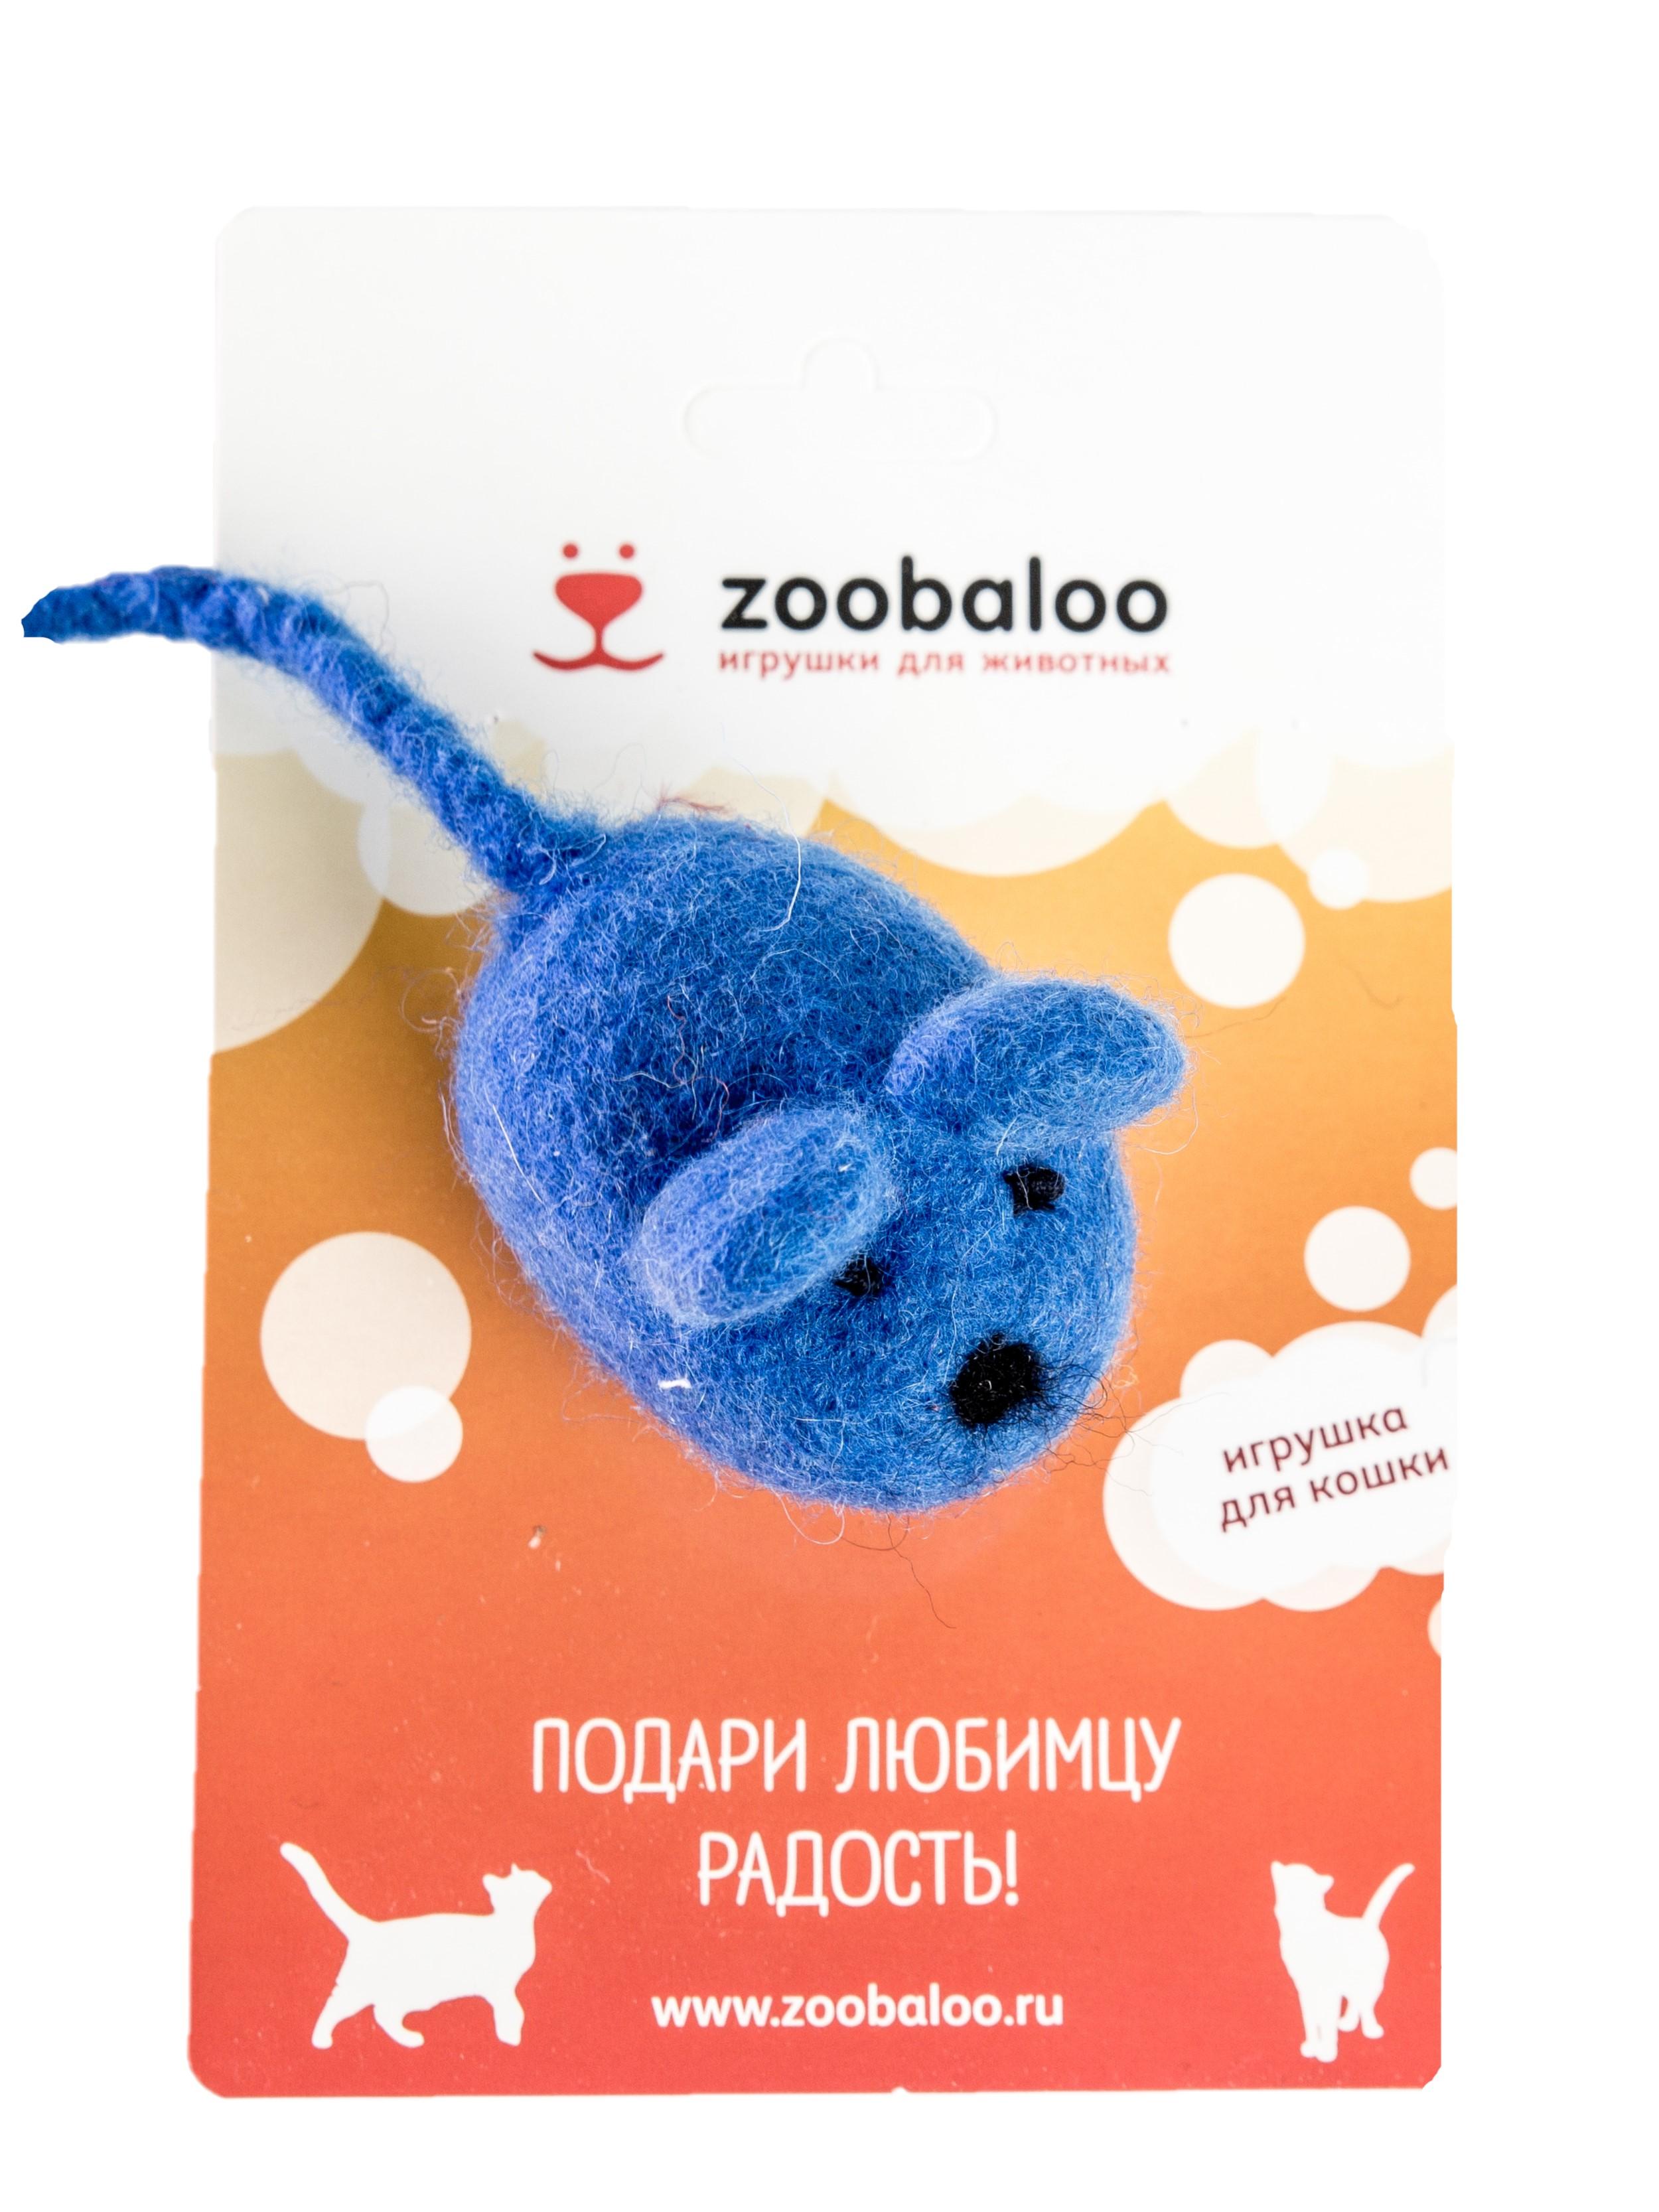 Игрушка Zoobaloo Шерстяная мышь Эмма 6см, 346, Синий